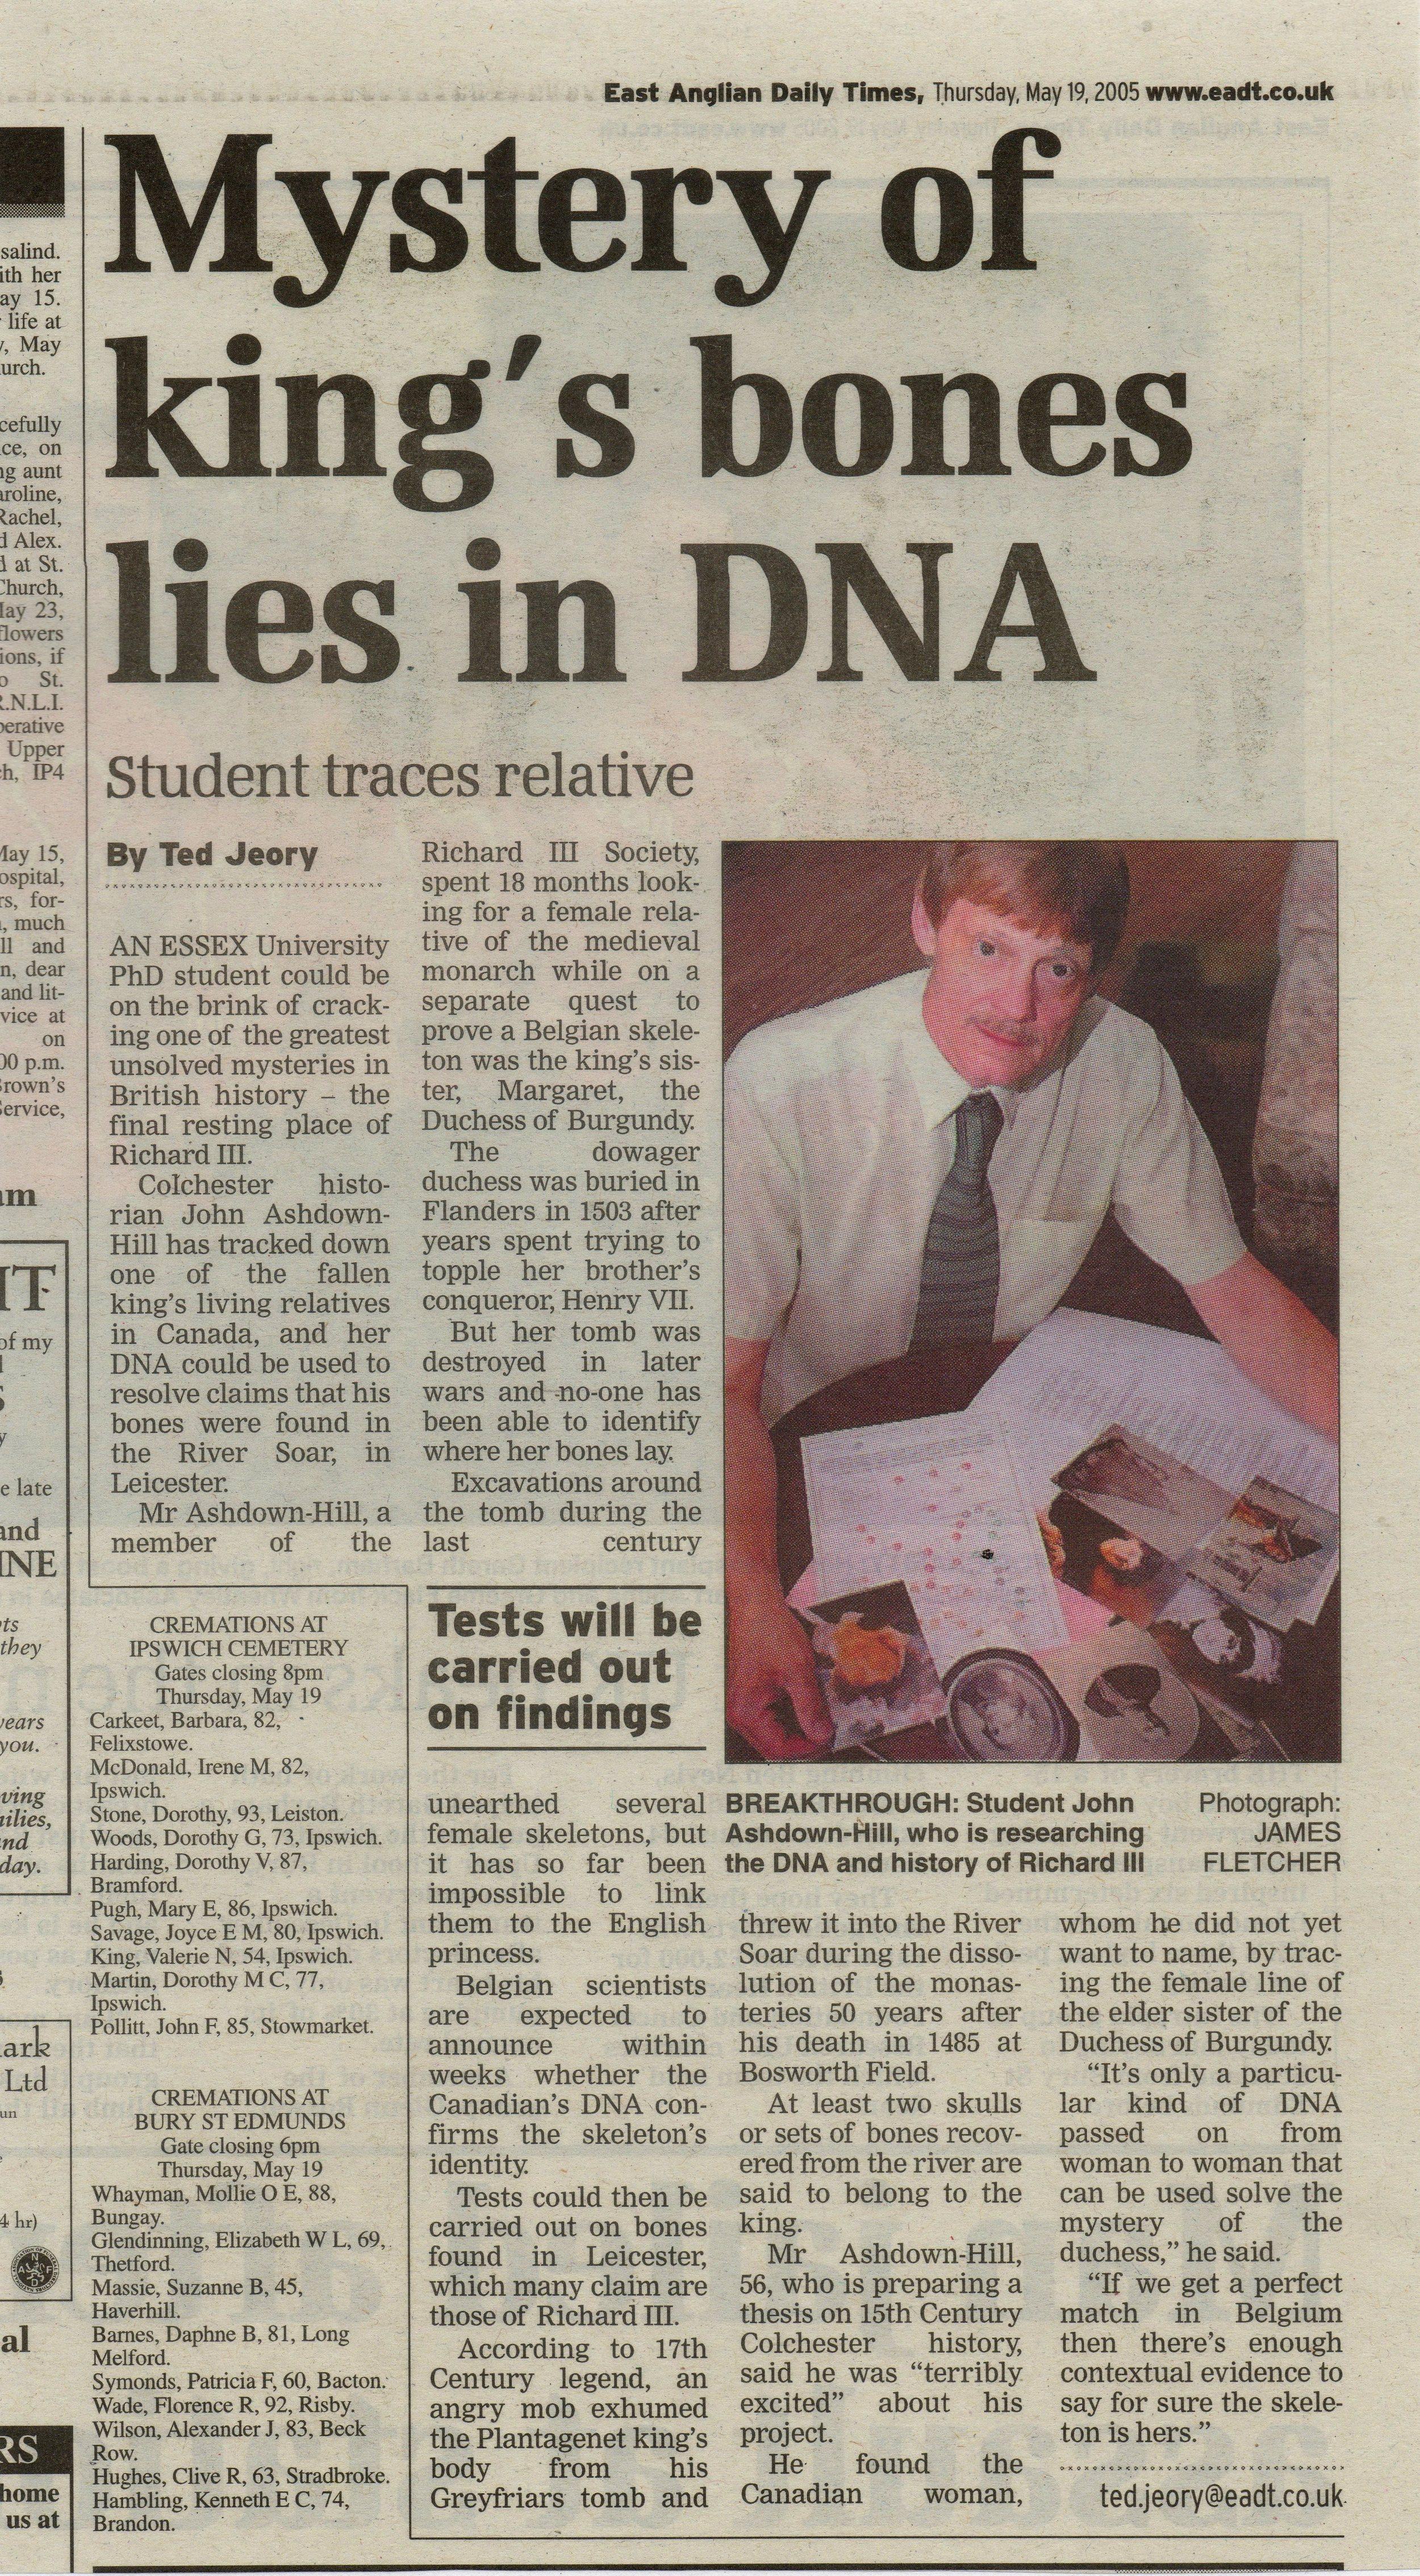 East Anglian Daily Times 11 May 2005.jpg